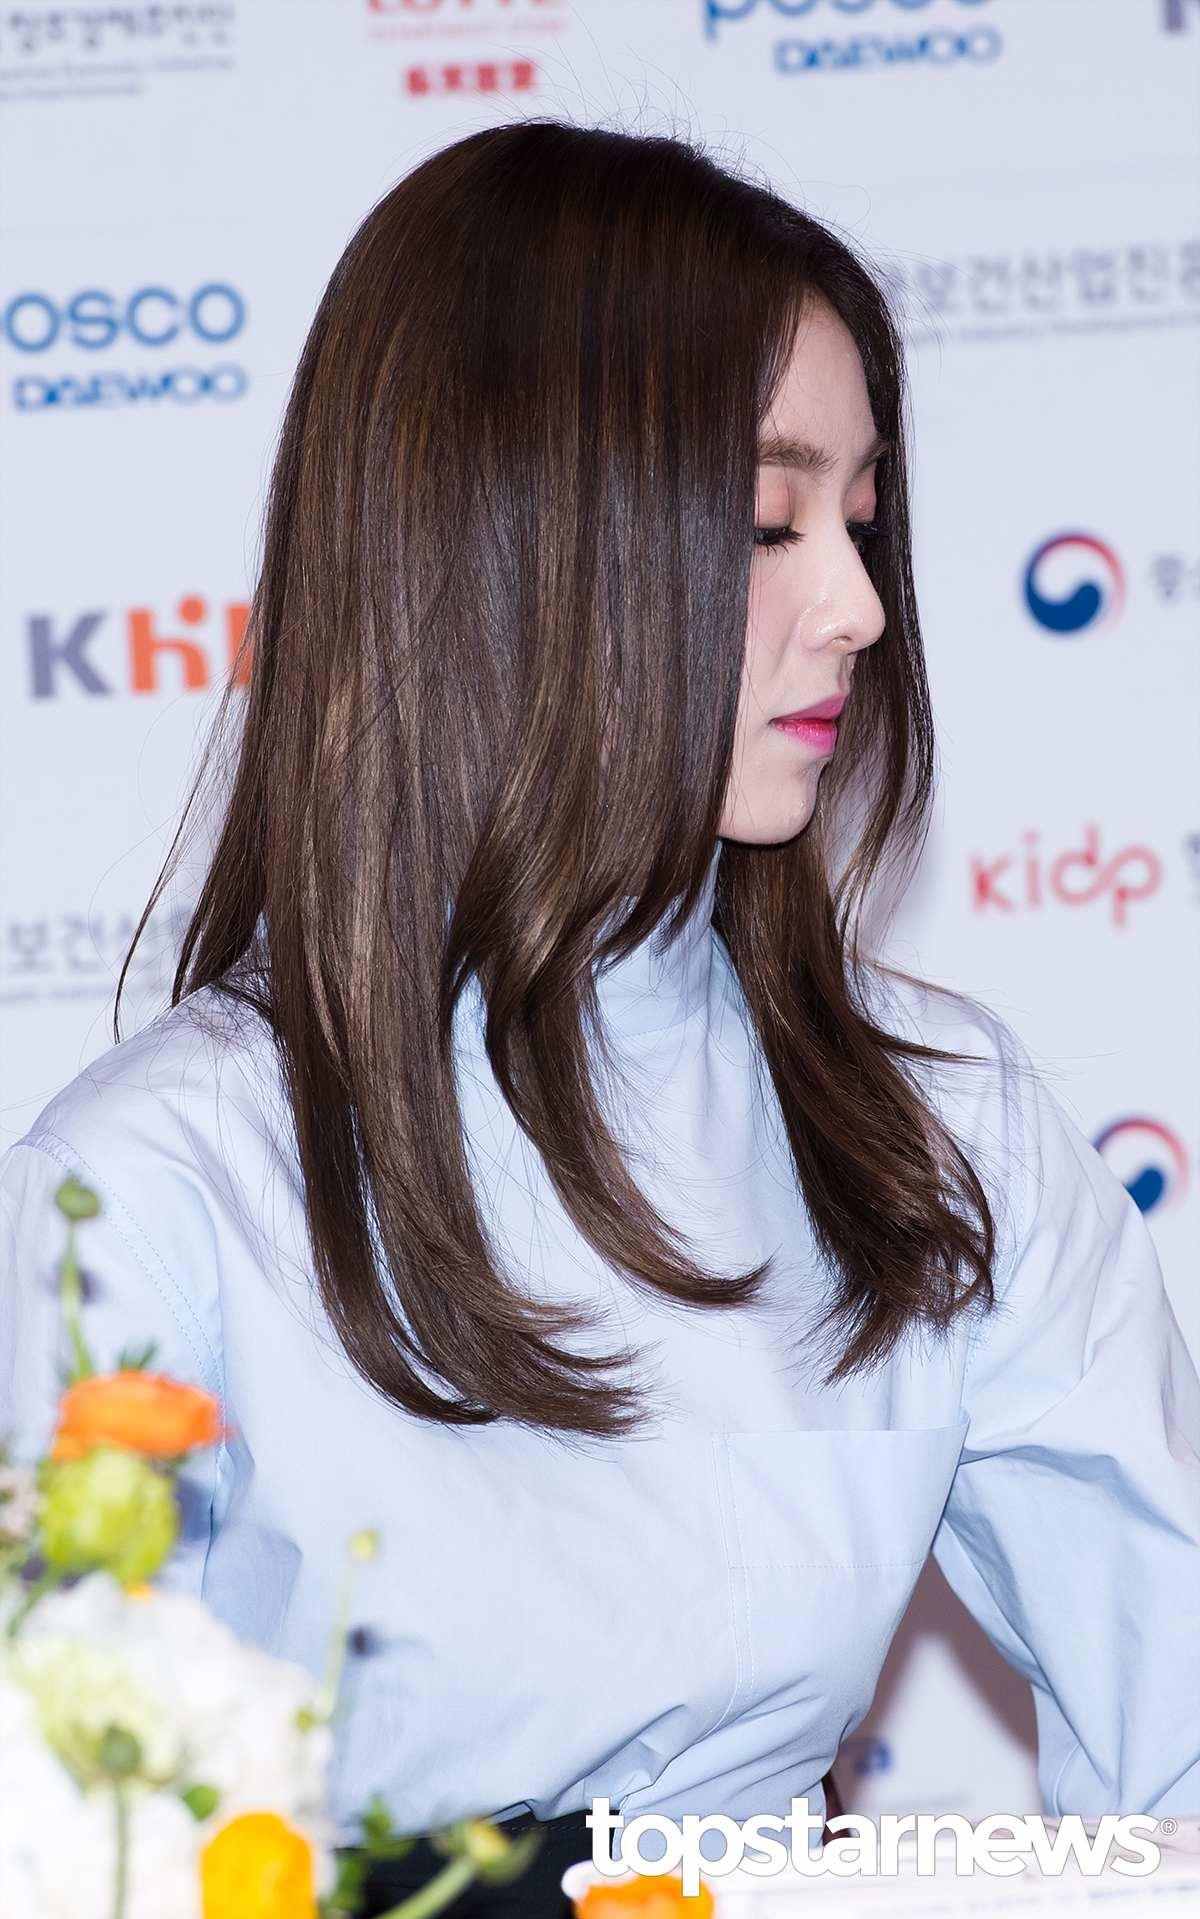 Irene的鼻子真的是堪稱完美,大部分亞洲人的鼻子能生得高已經不錯了,但她鼻樑的弧度和翹翹的鼻尖只有西方人常見,很靈氣。